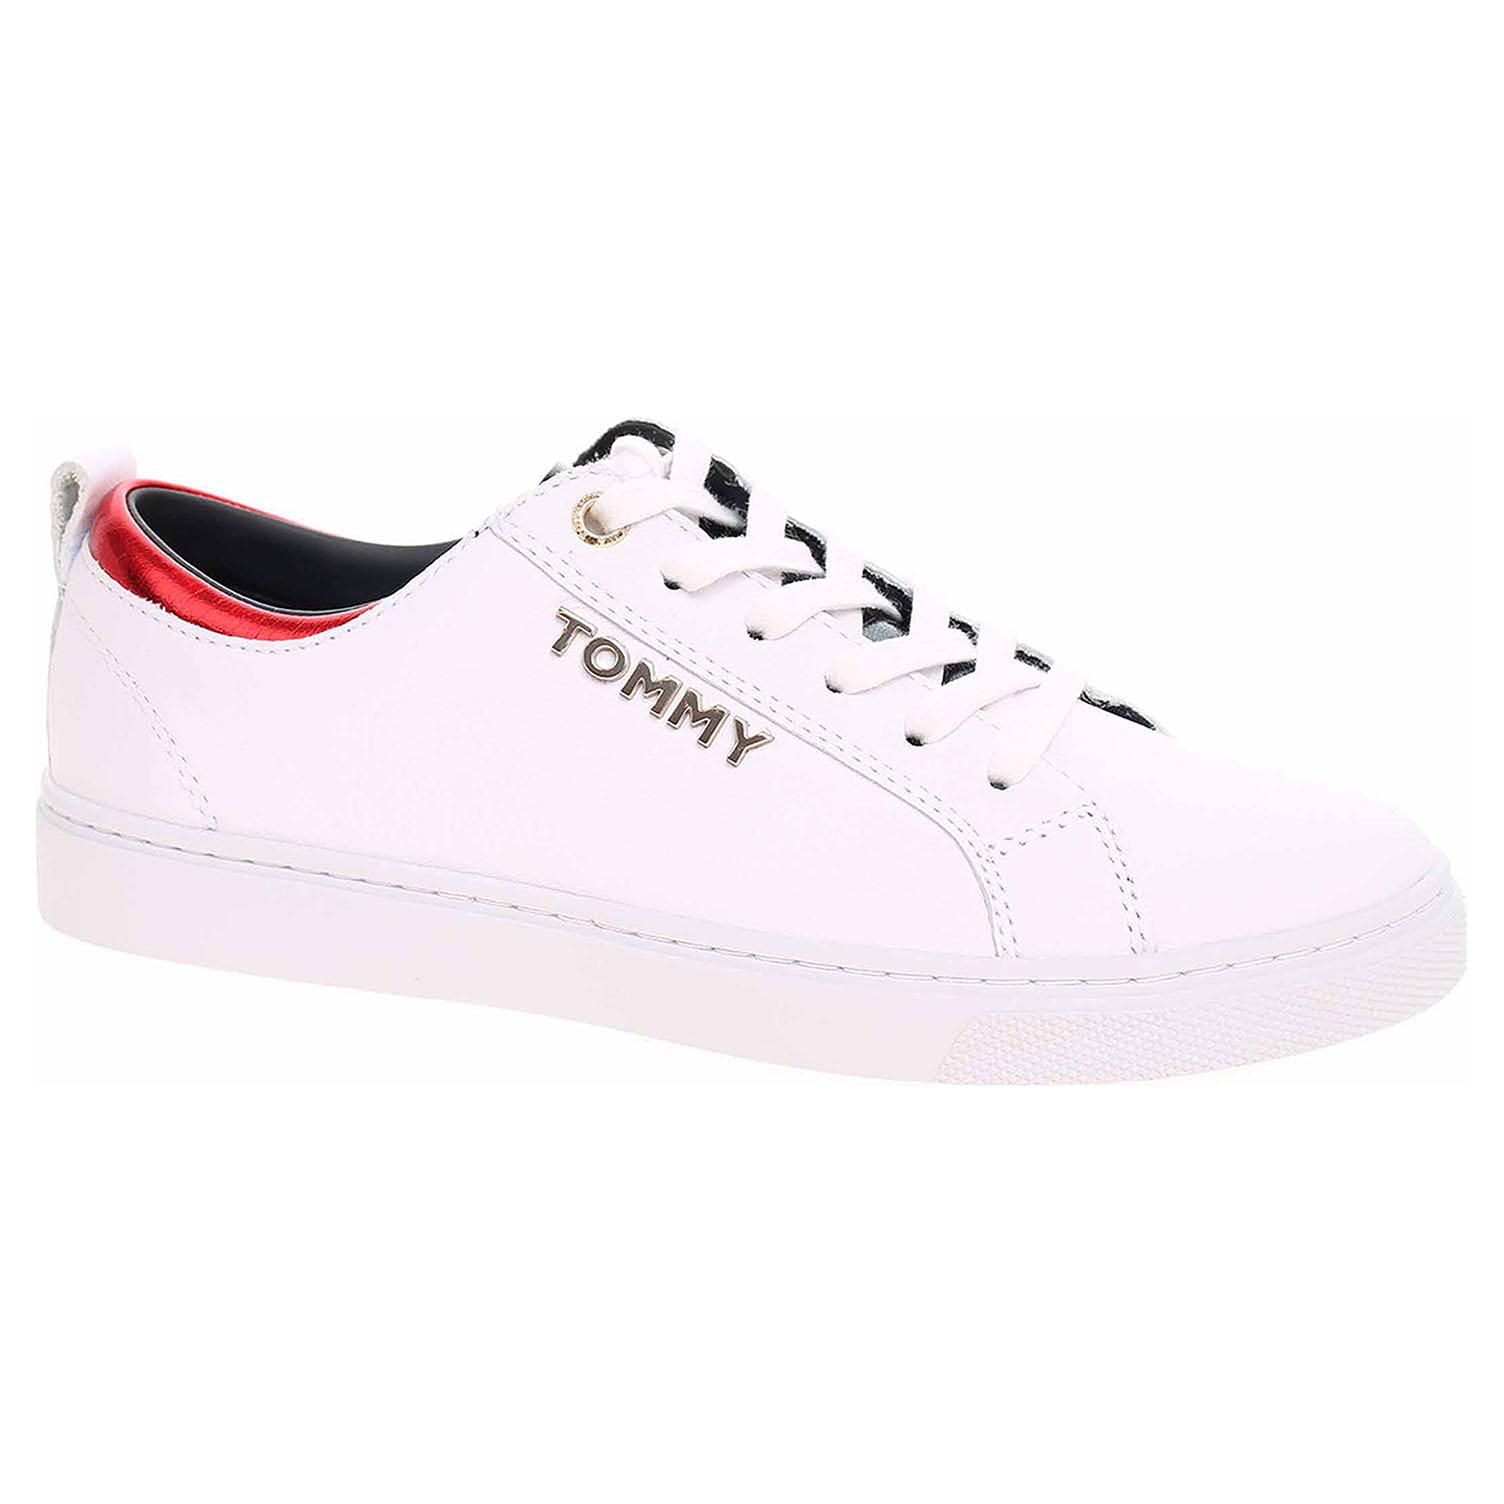 b68a17b3a Dámská obuv Tommy Hilfiger FW0FW03776 100 white | Rejnok obuv